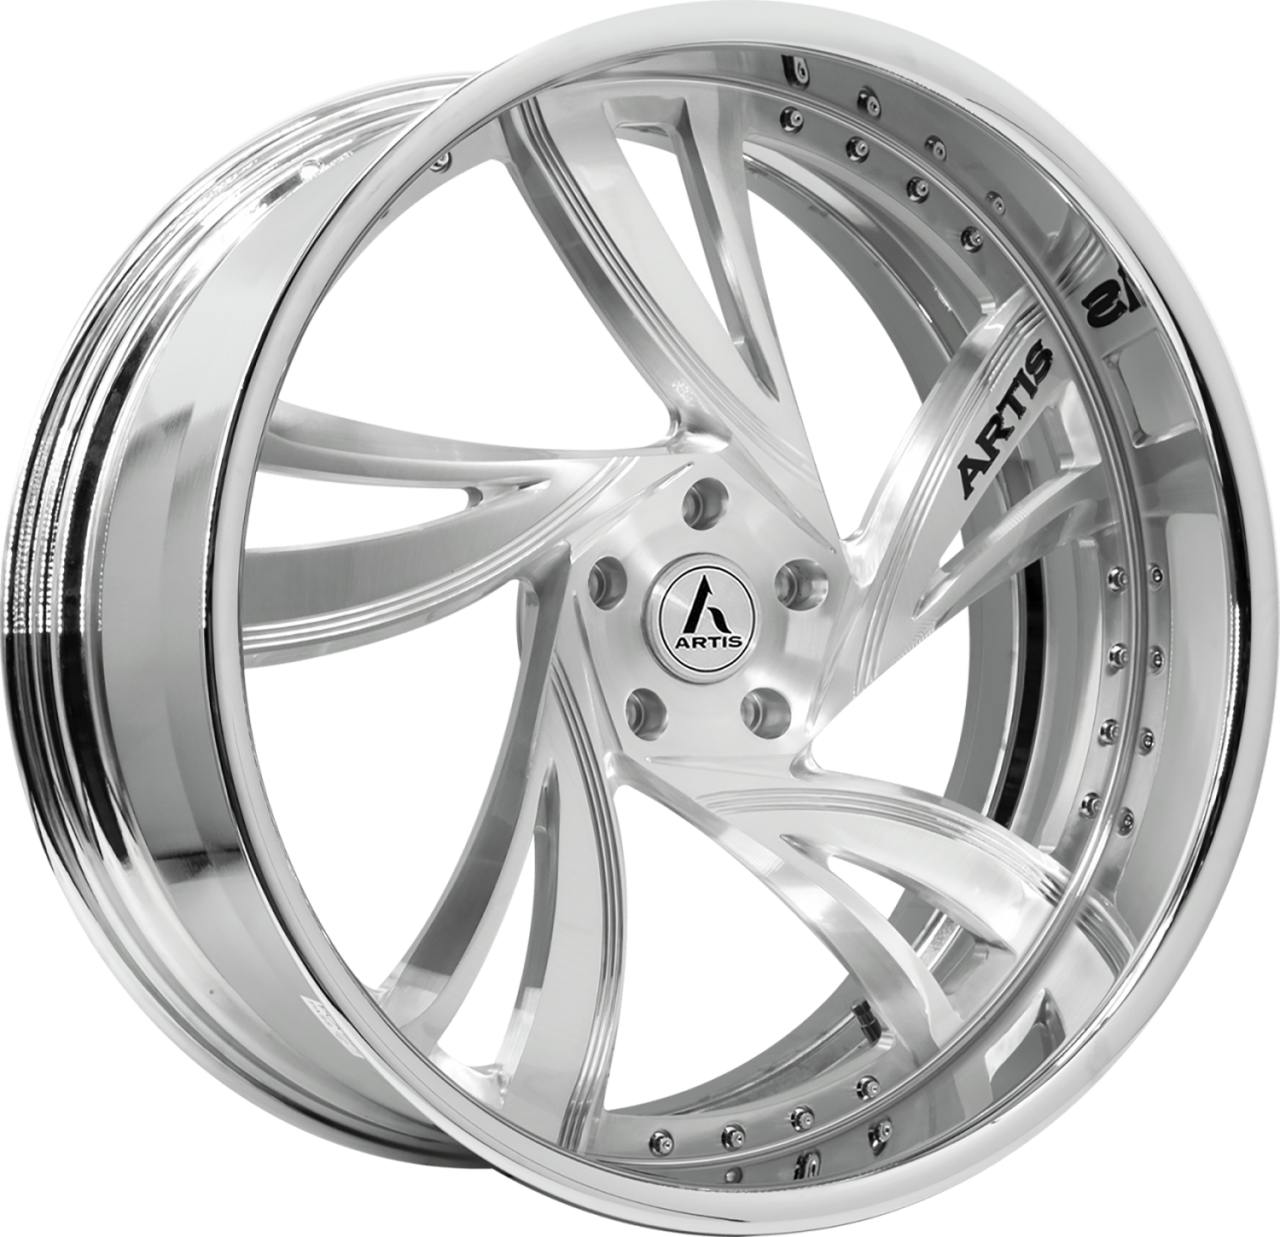 Artis Forged Kingston-M wheel with Brushed finish